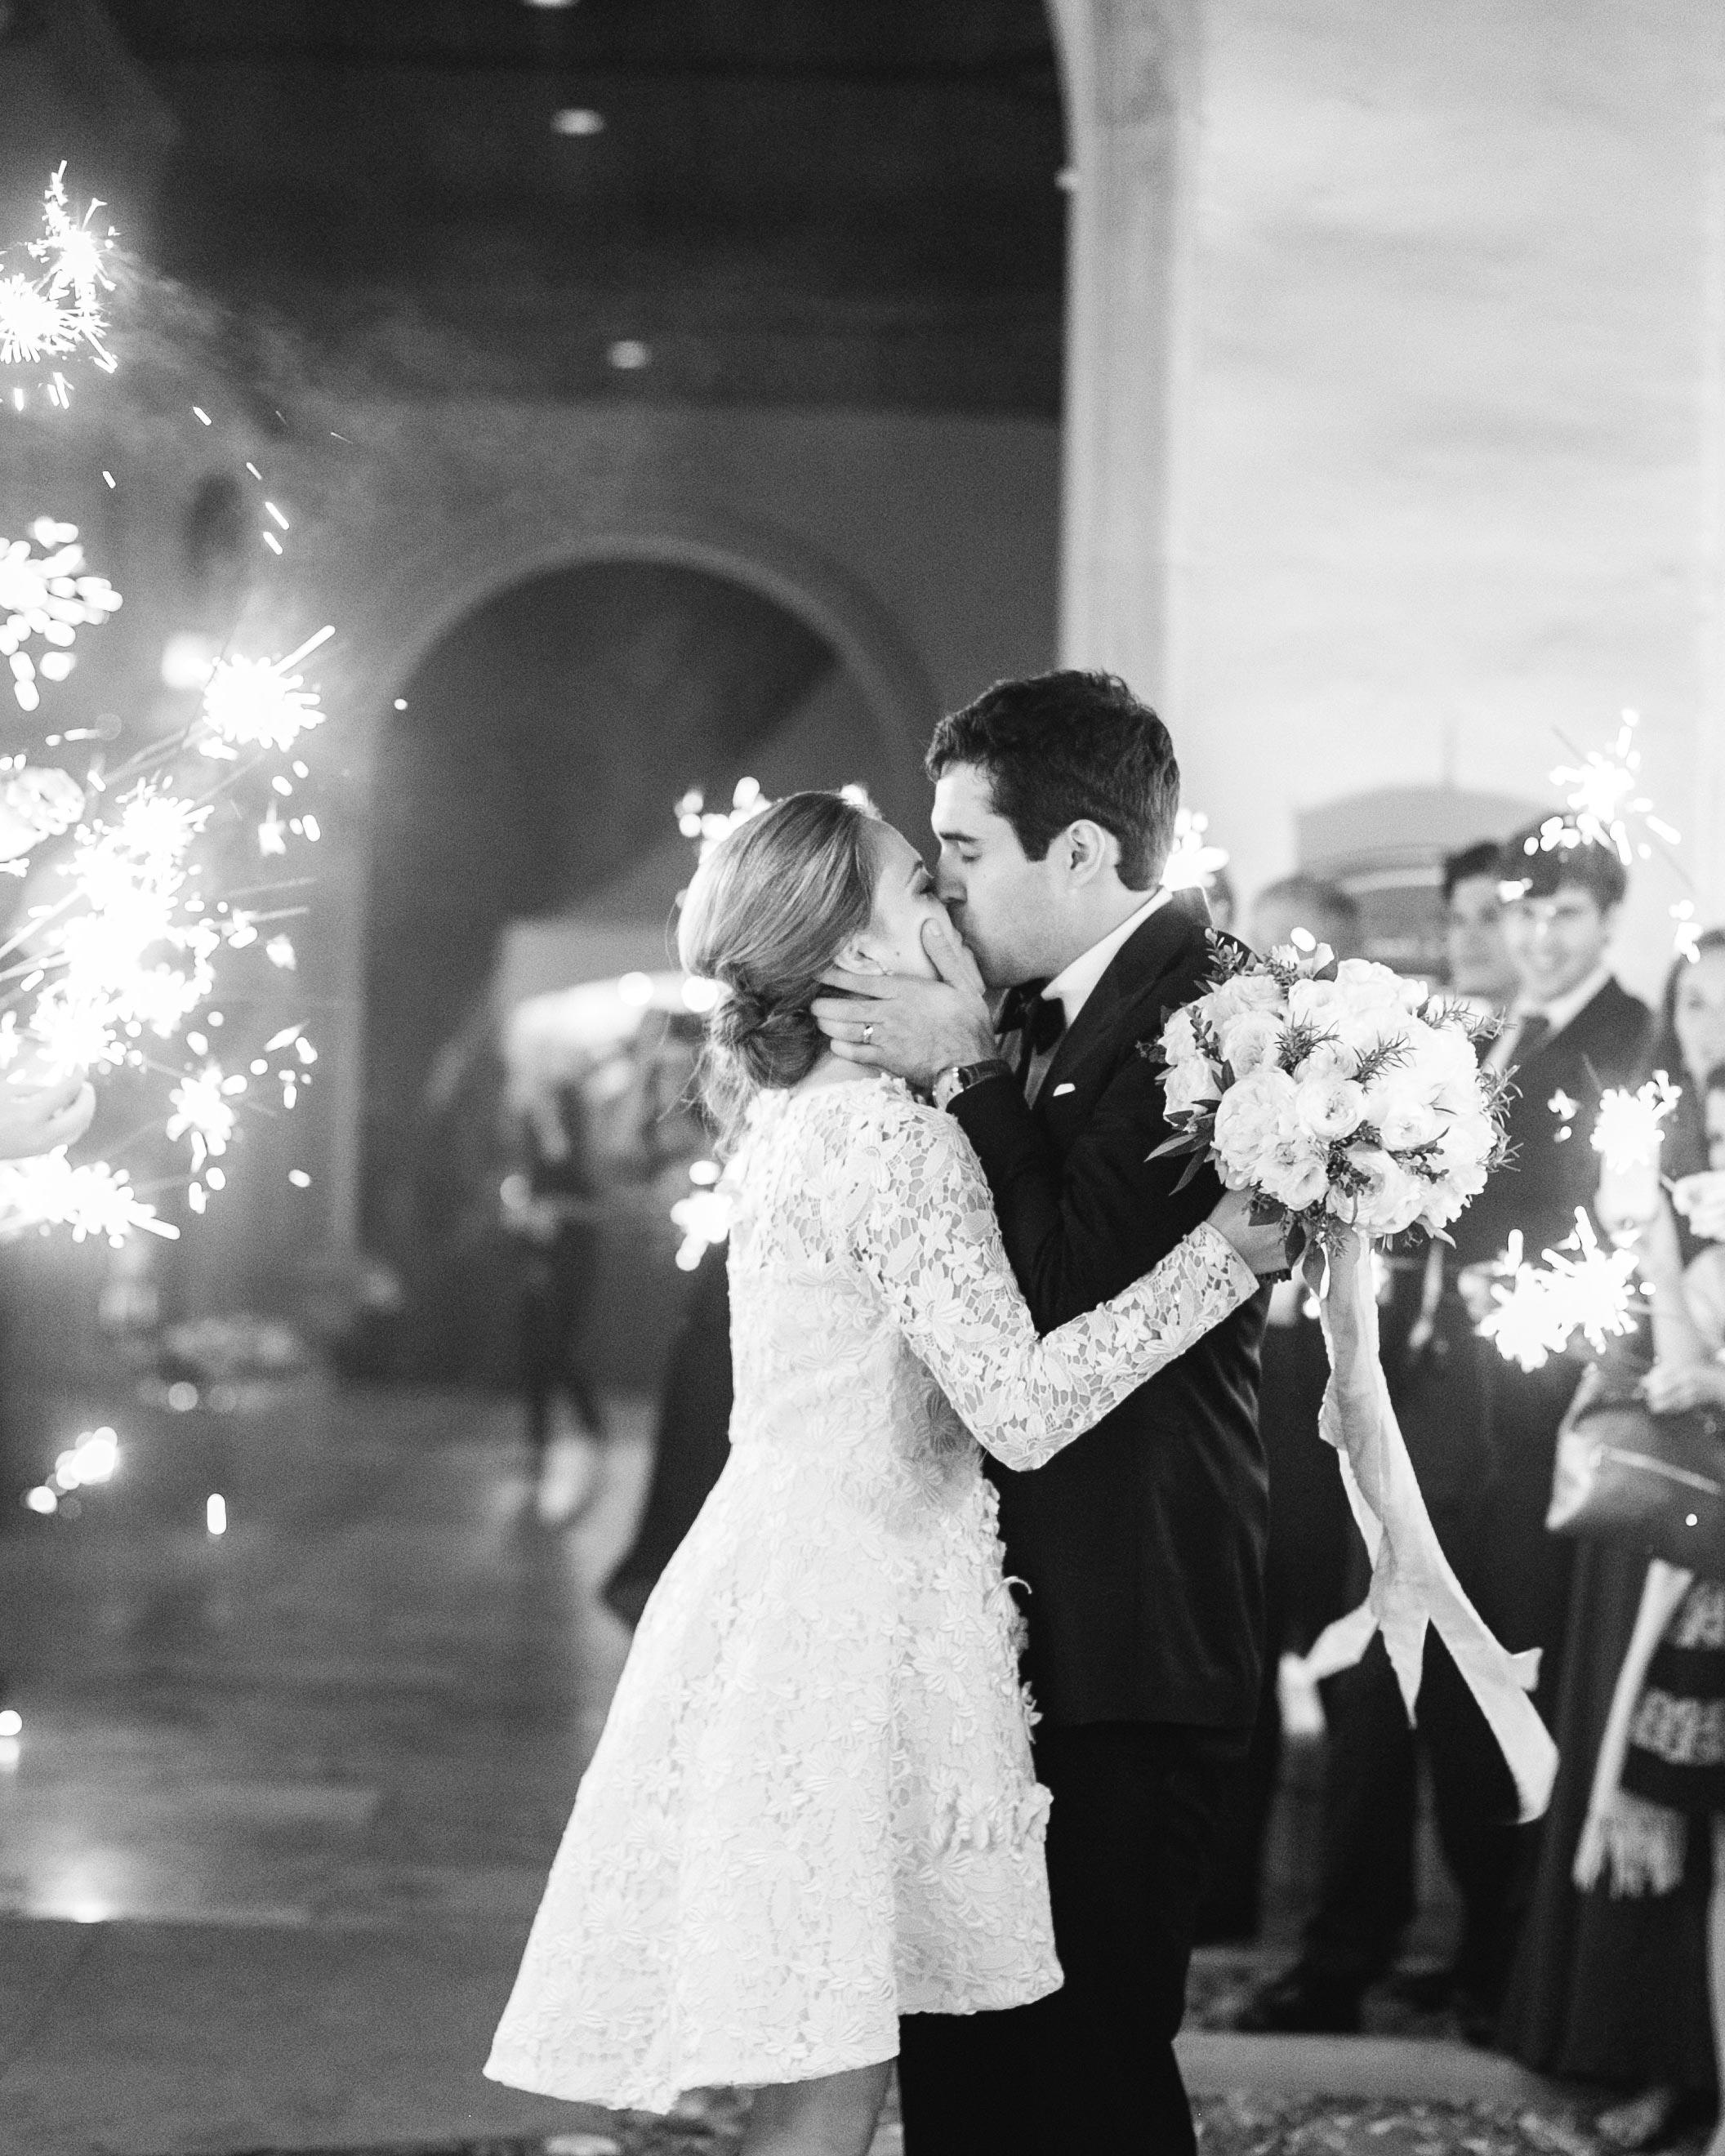 John Legend and Chrissy Teigen Kissing at Wedding